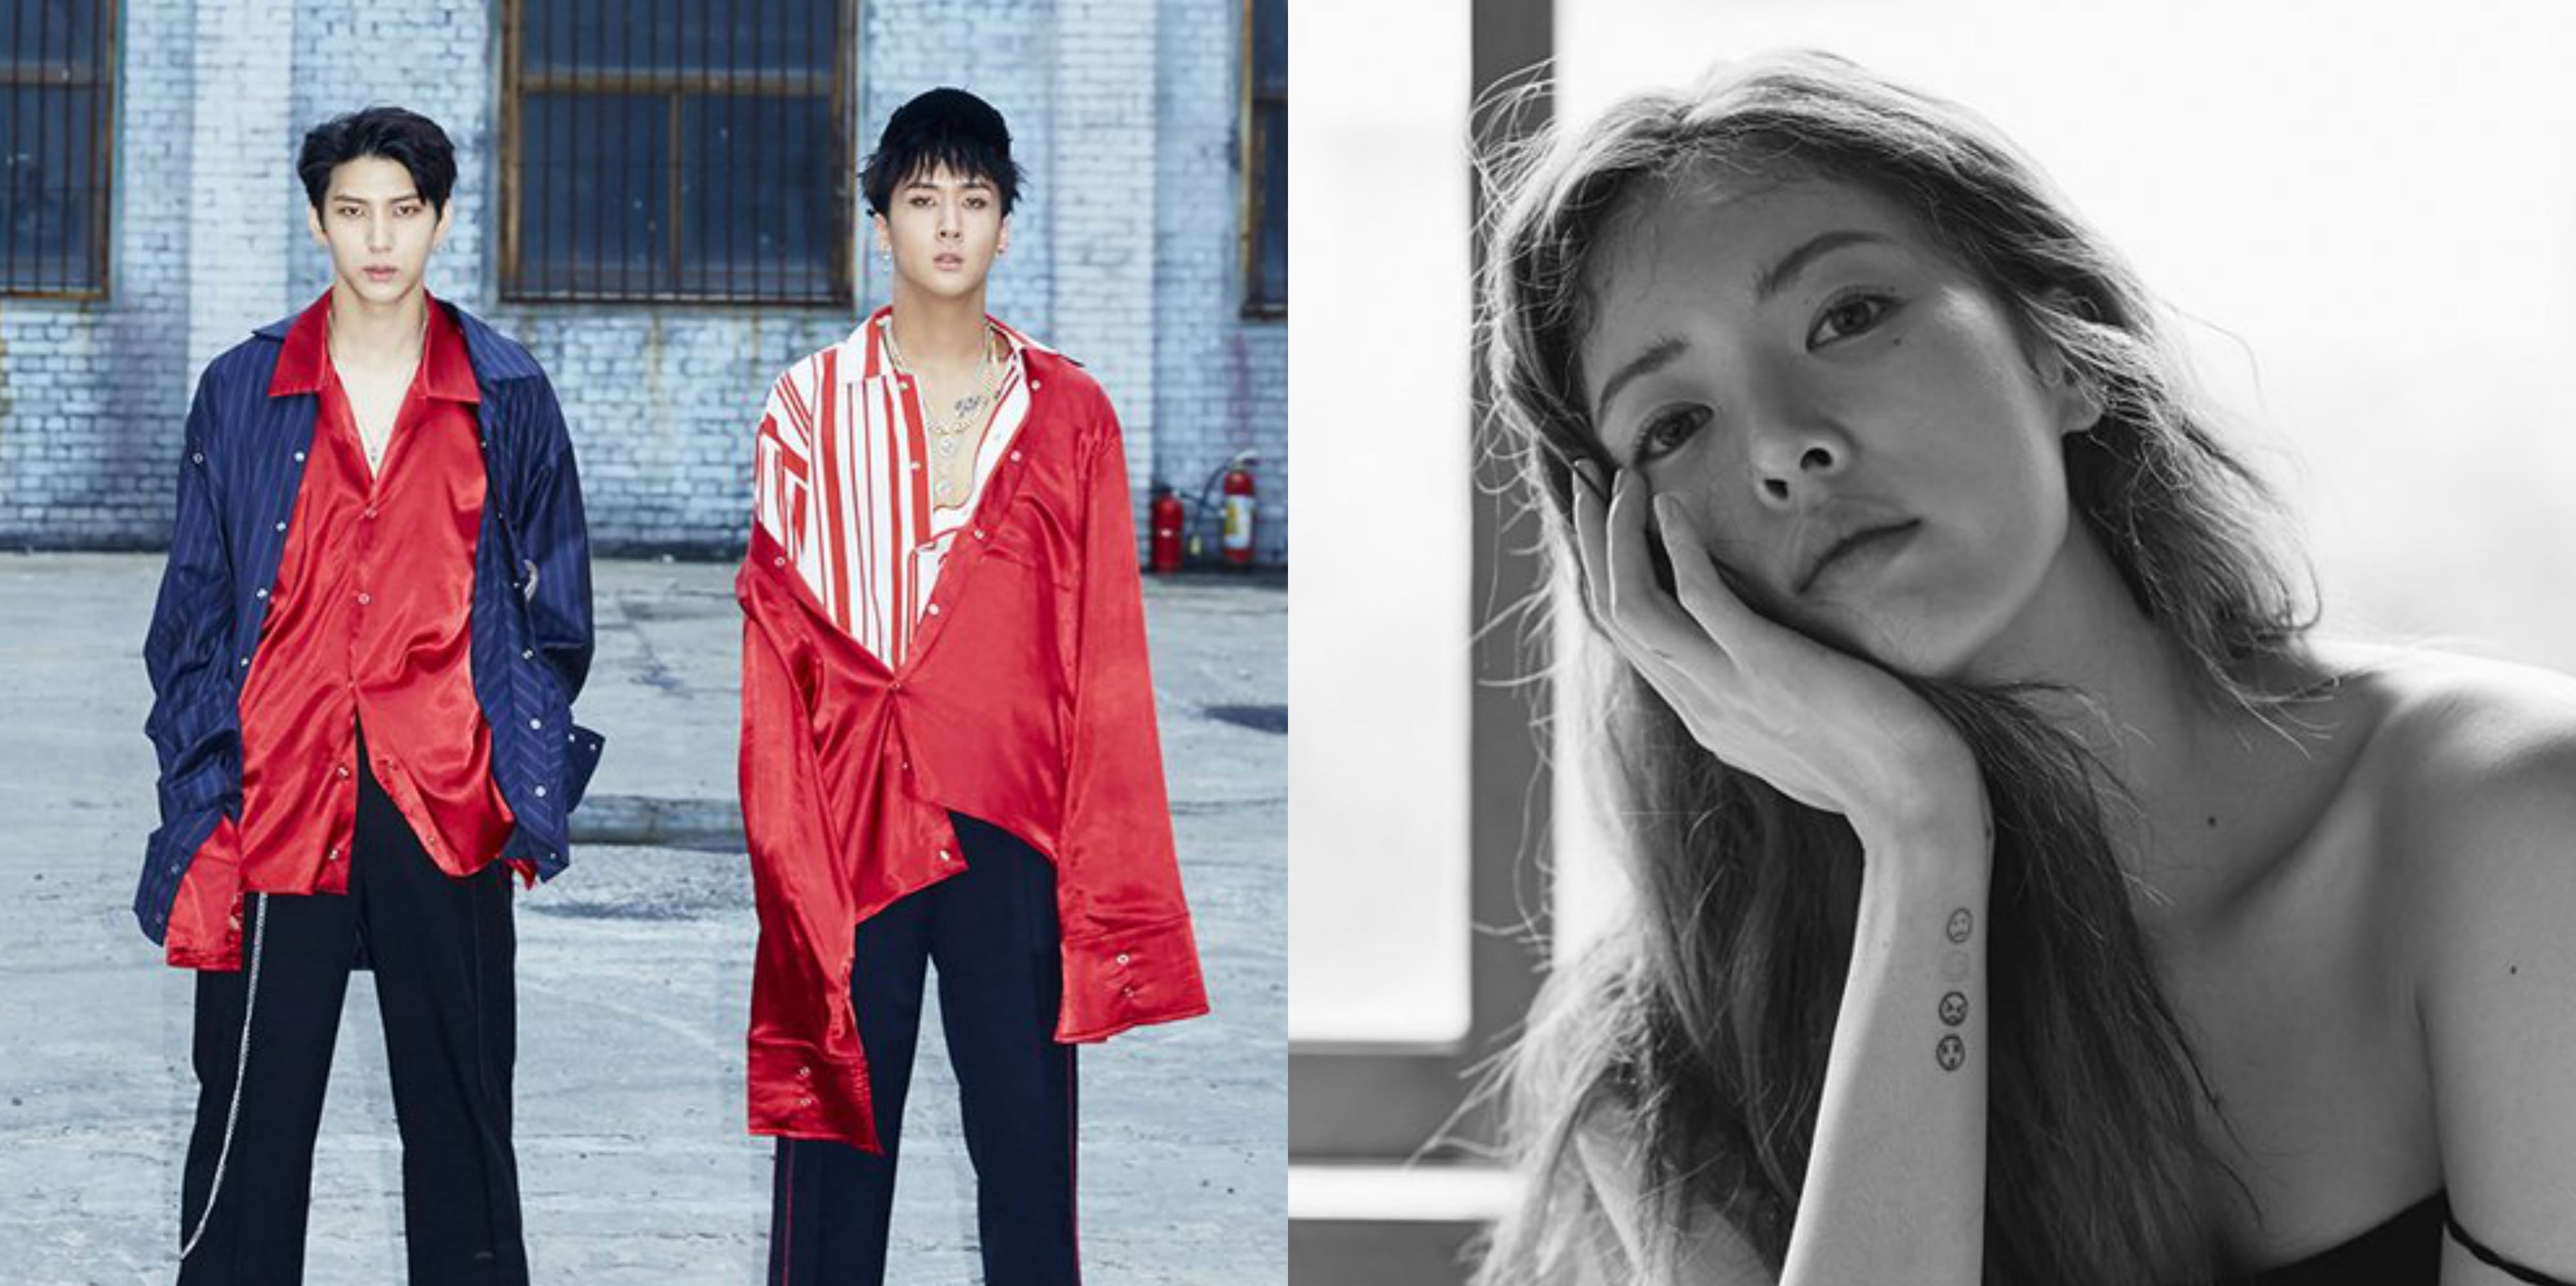 VIXX LR And HyunA's New Mini Albums Make Impressive Debuts On Billboard's World Albums Chart